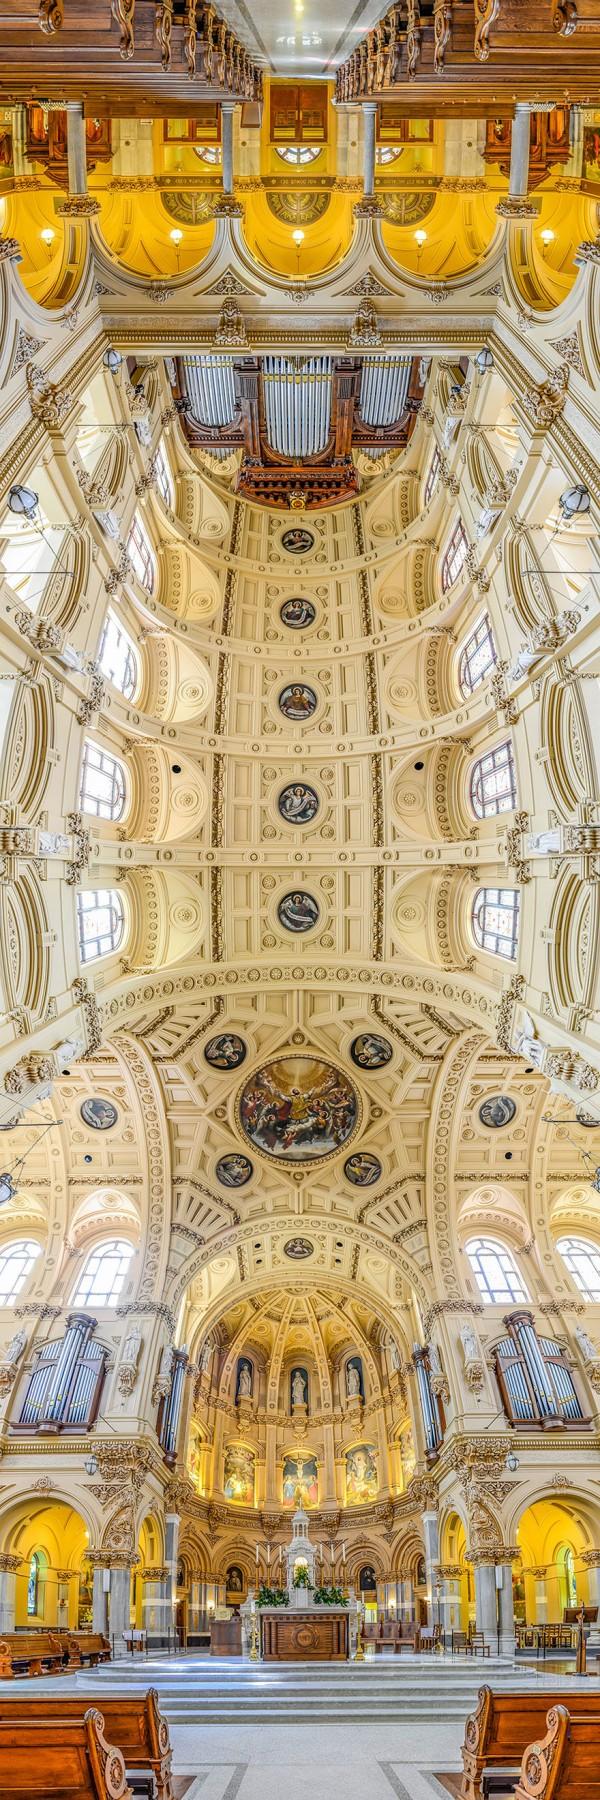 fotos-panoramicas-verticales-iglesias-nueva-york-richard-silver-7